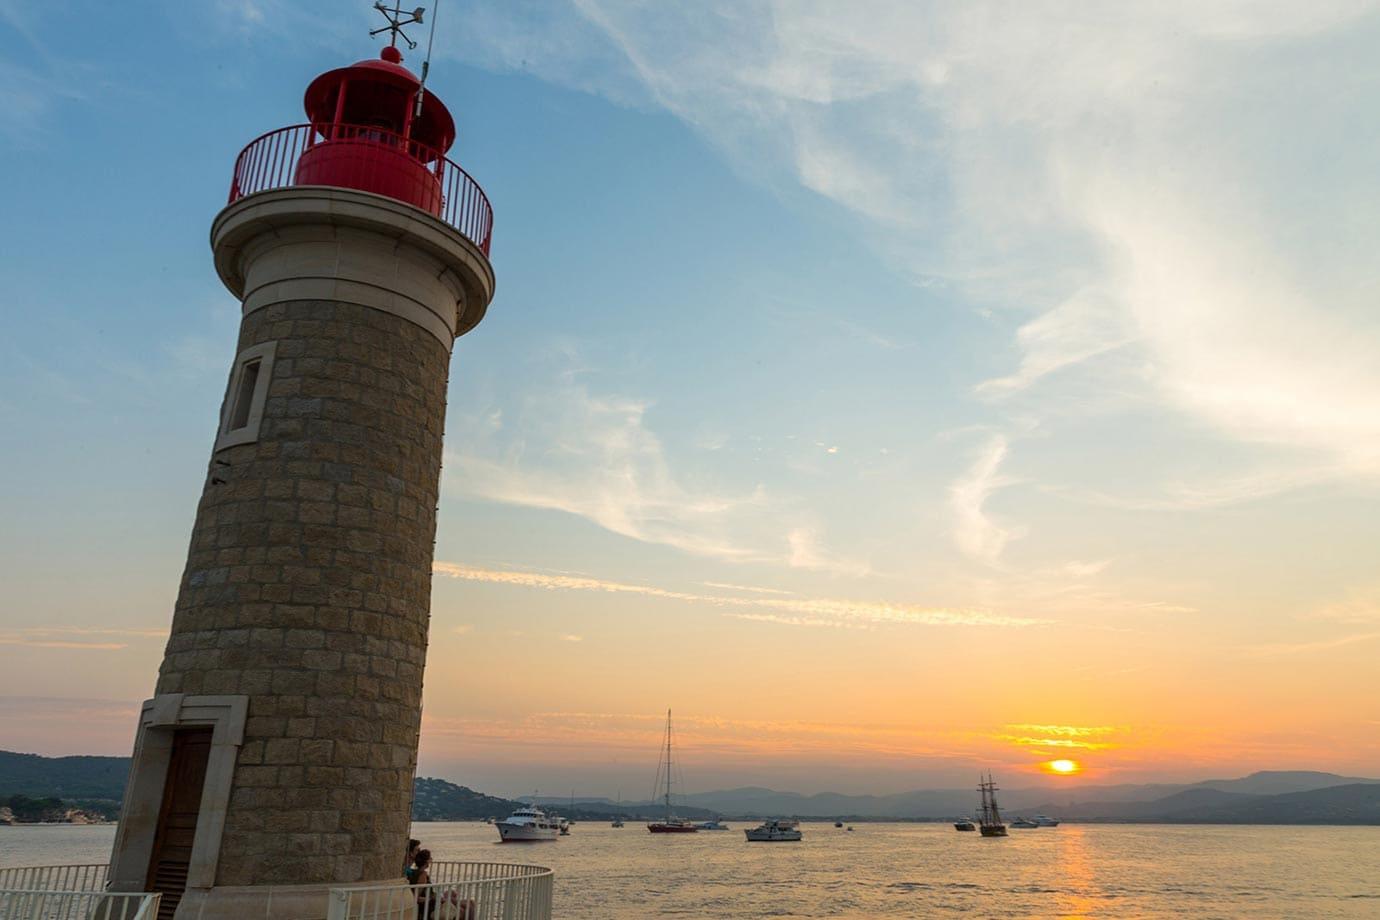 Sunset in St-Tropez